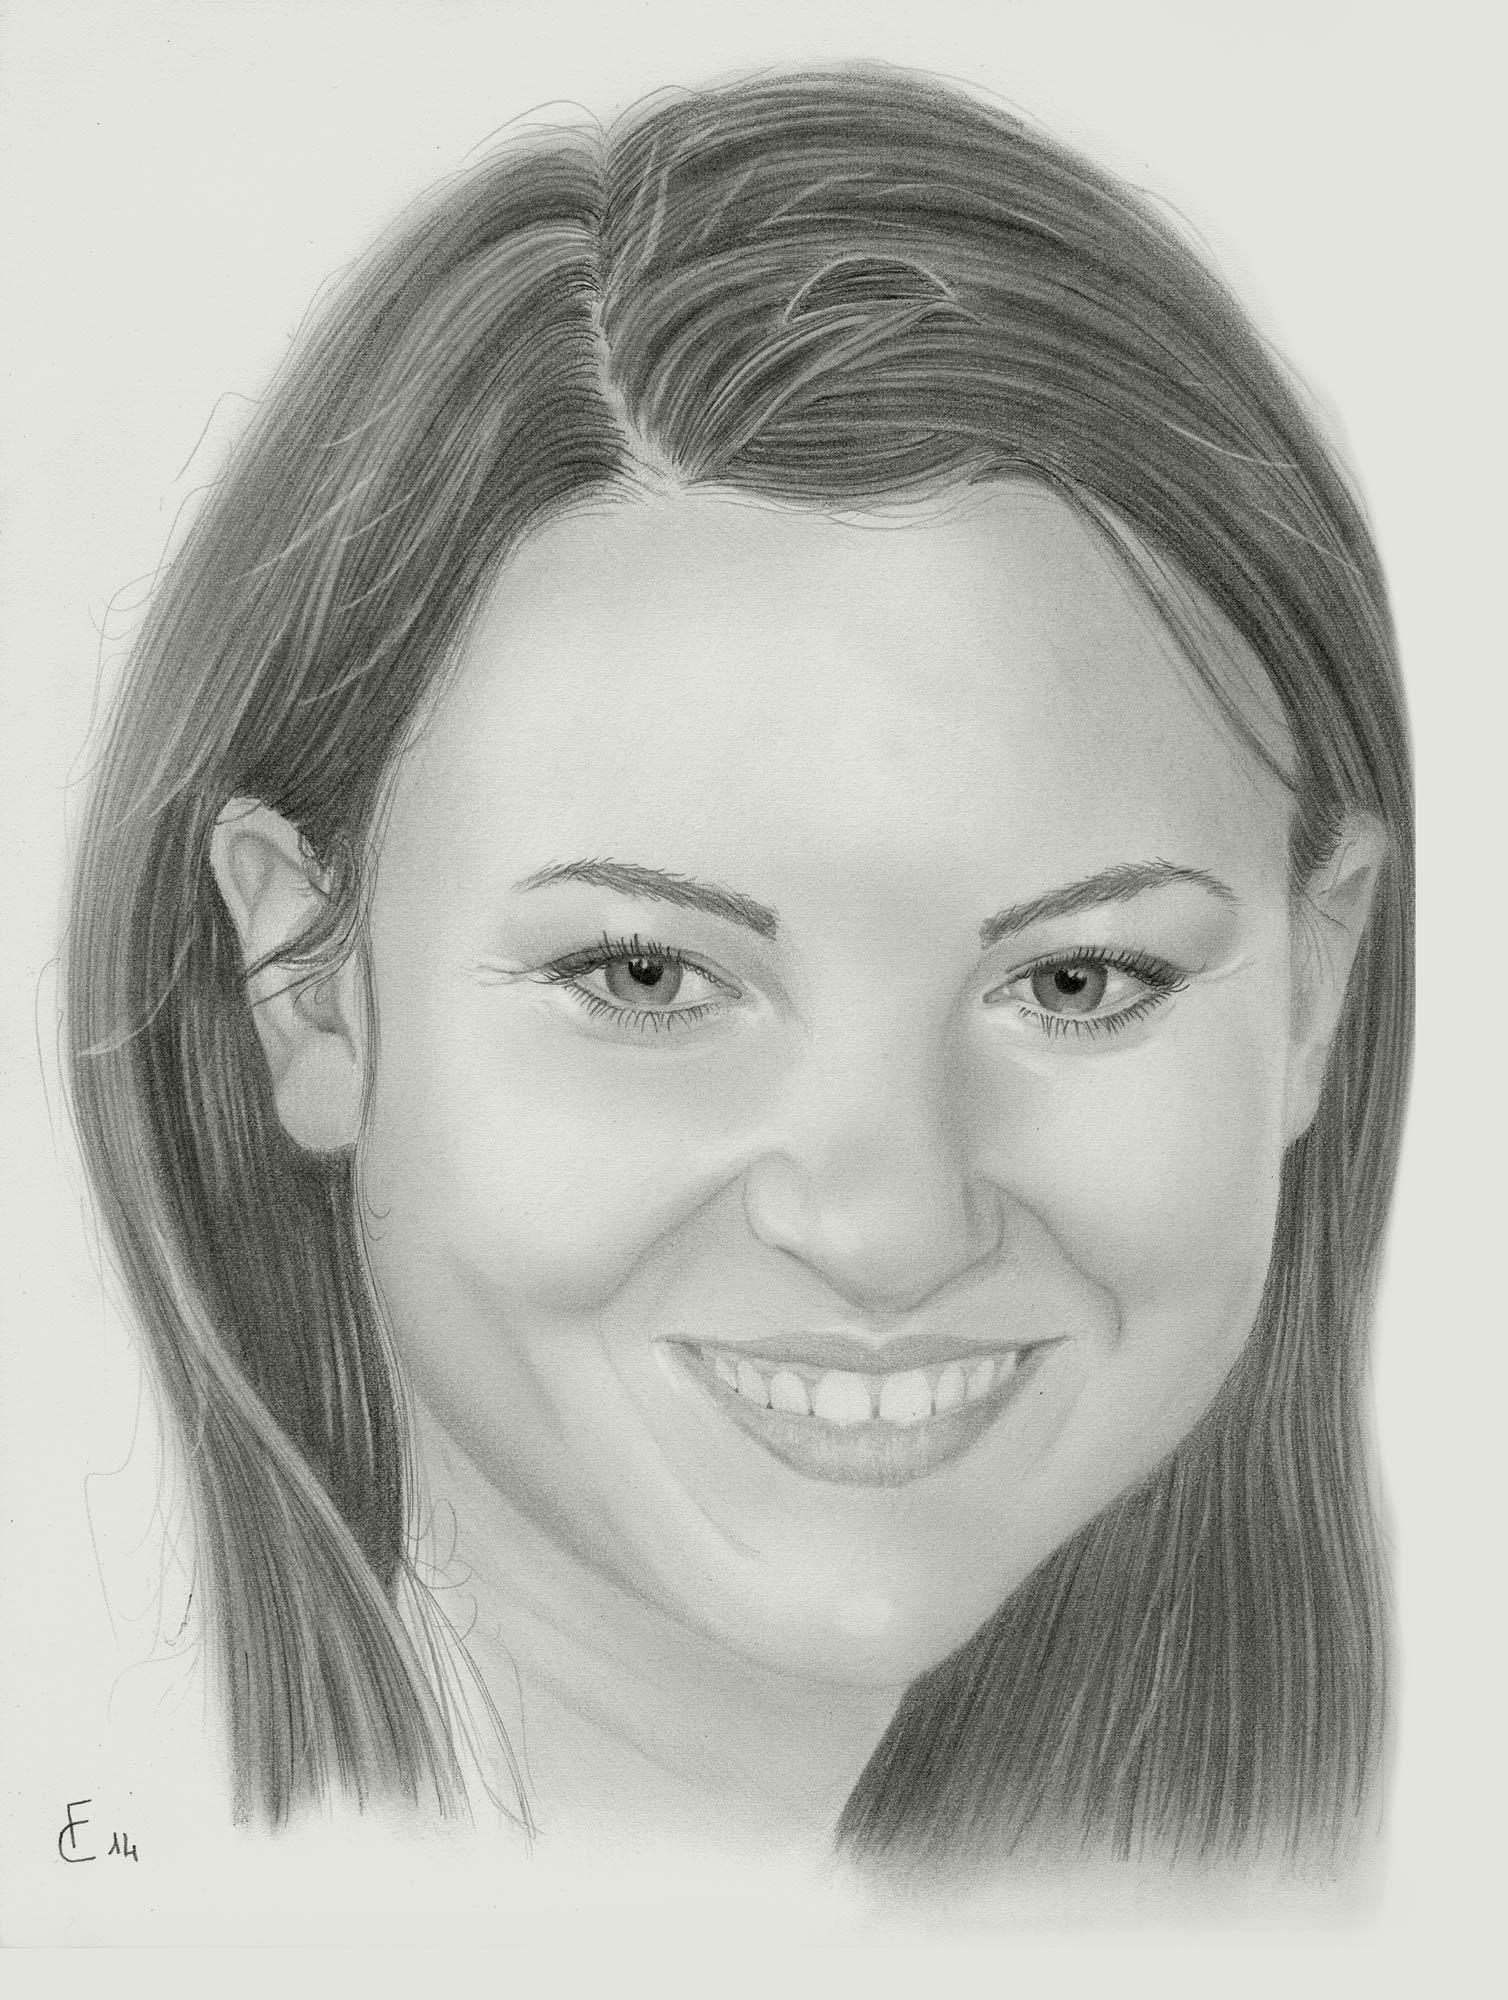 Volti disegnati a matita qd07 regardsdefemmes for Immagini teschi disegnati